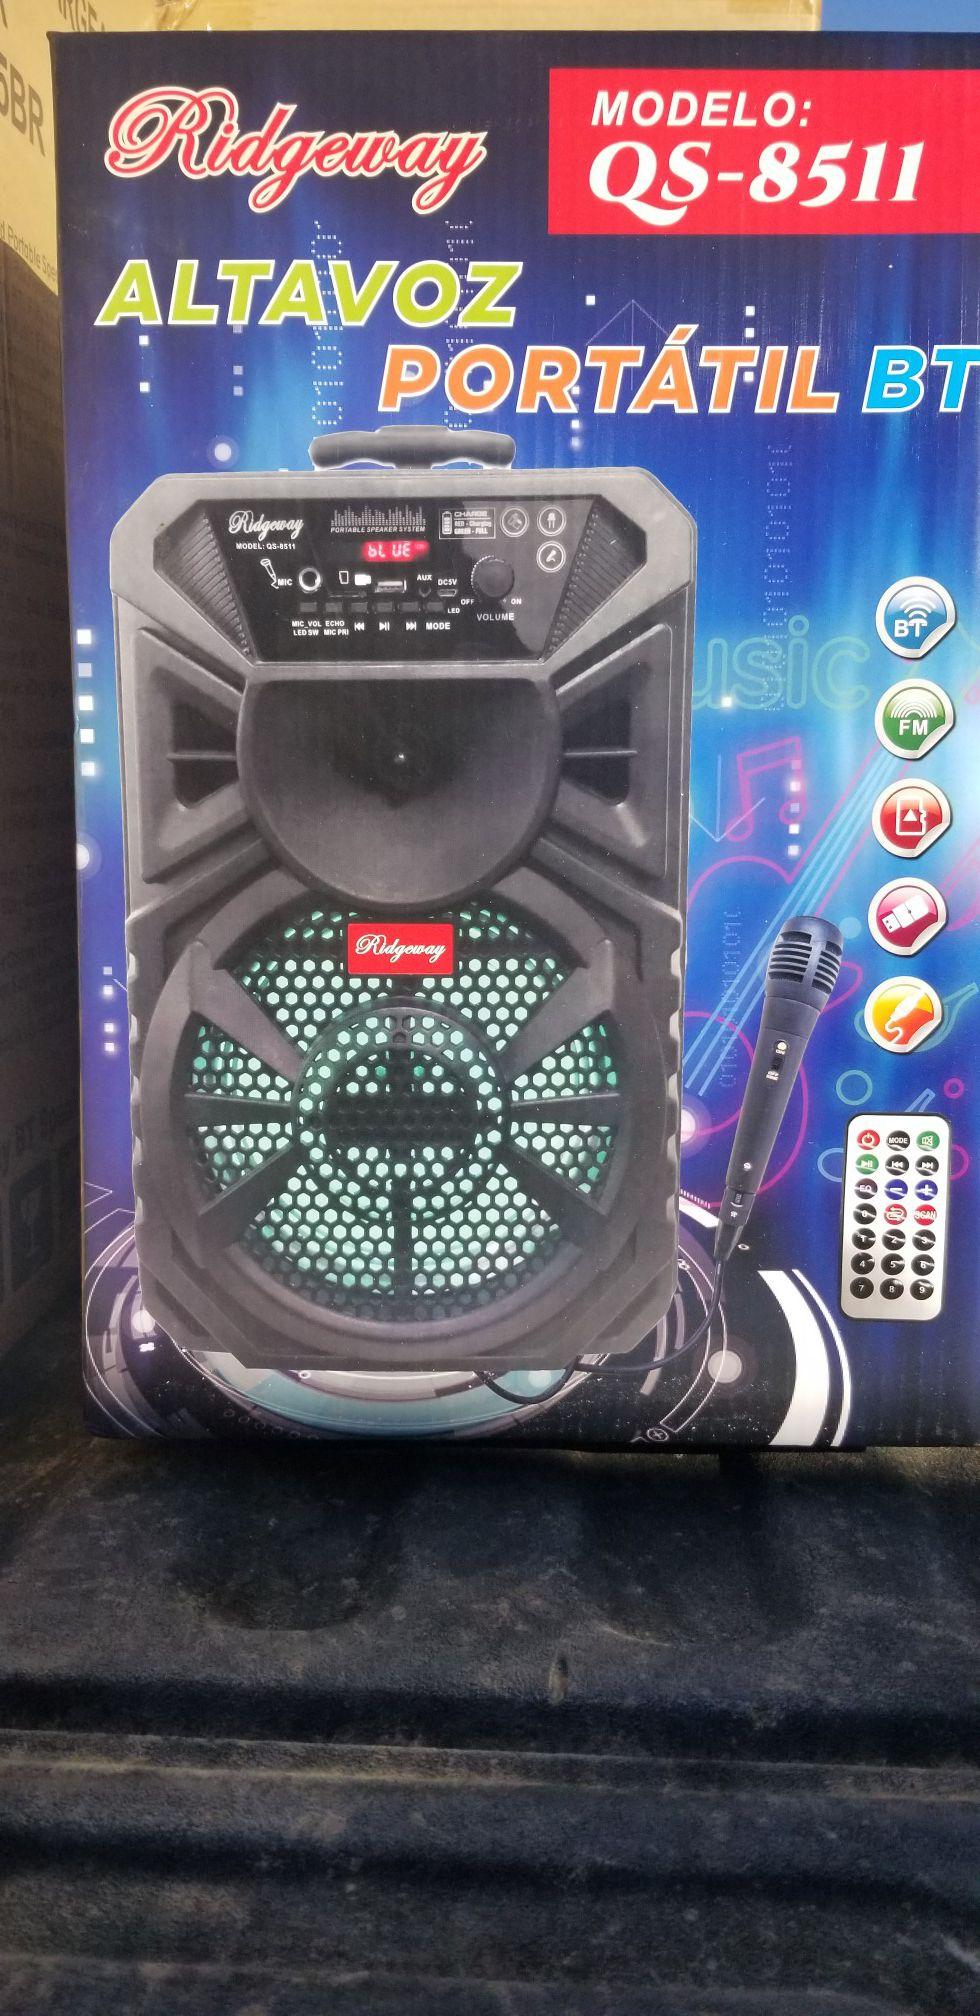 8 Inch New Bluetooth Speaker SD Card, Slot USB Port, FM Radio, Microphone Included For Karaoke ( Bosina ) Bz3